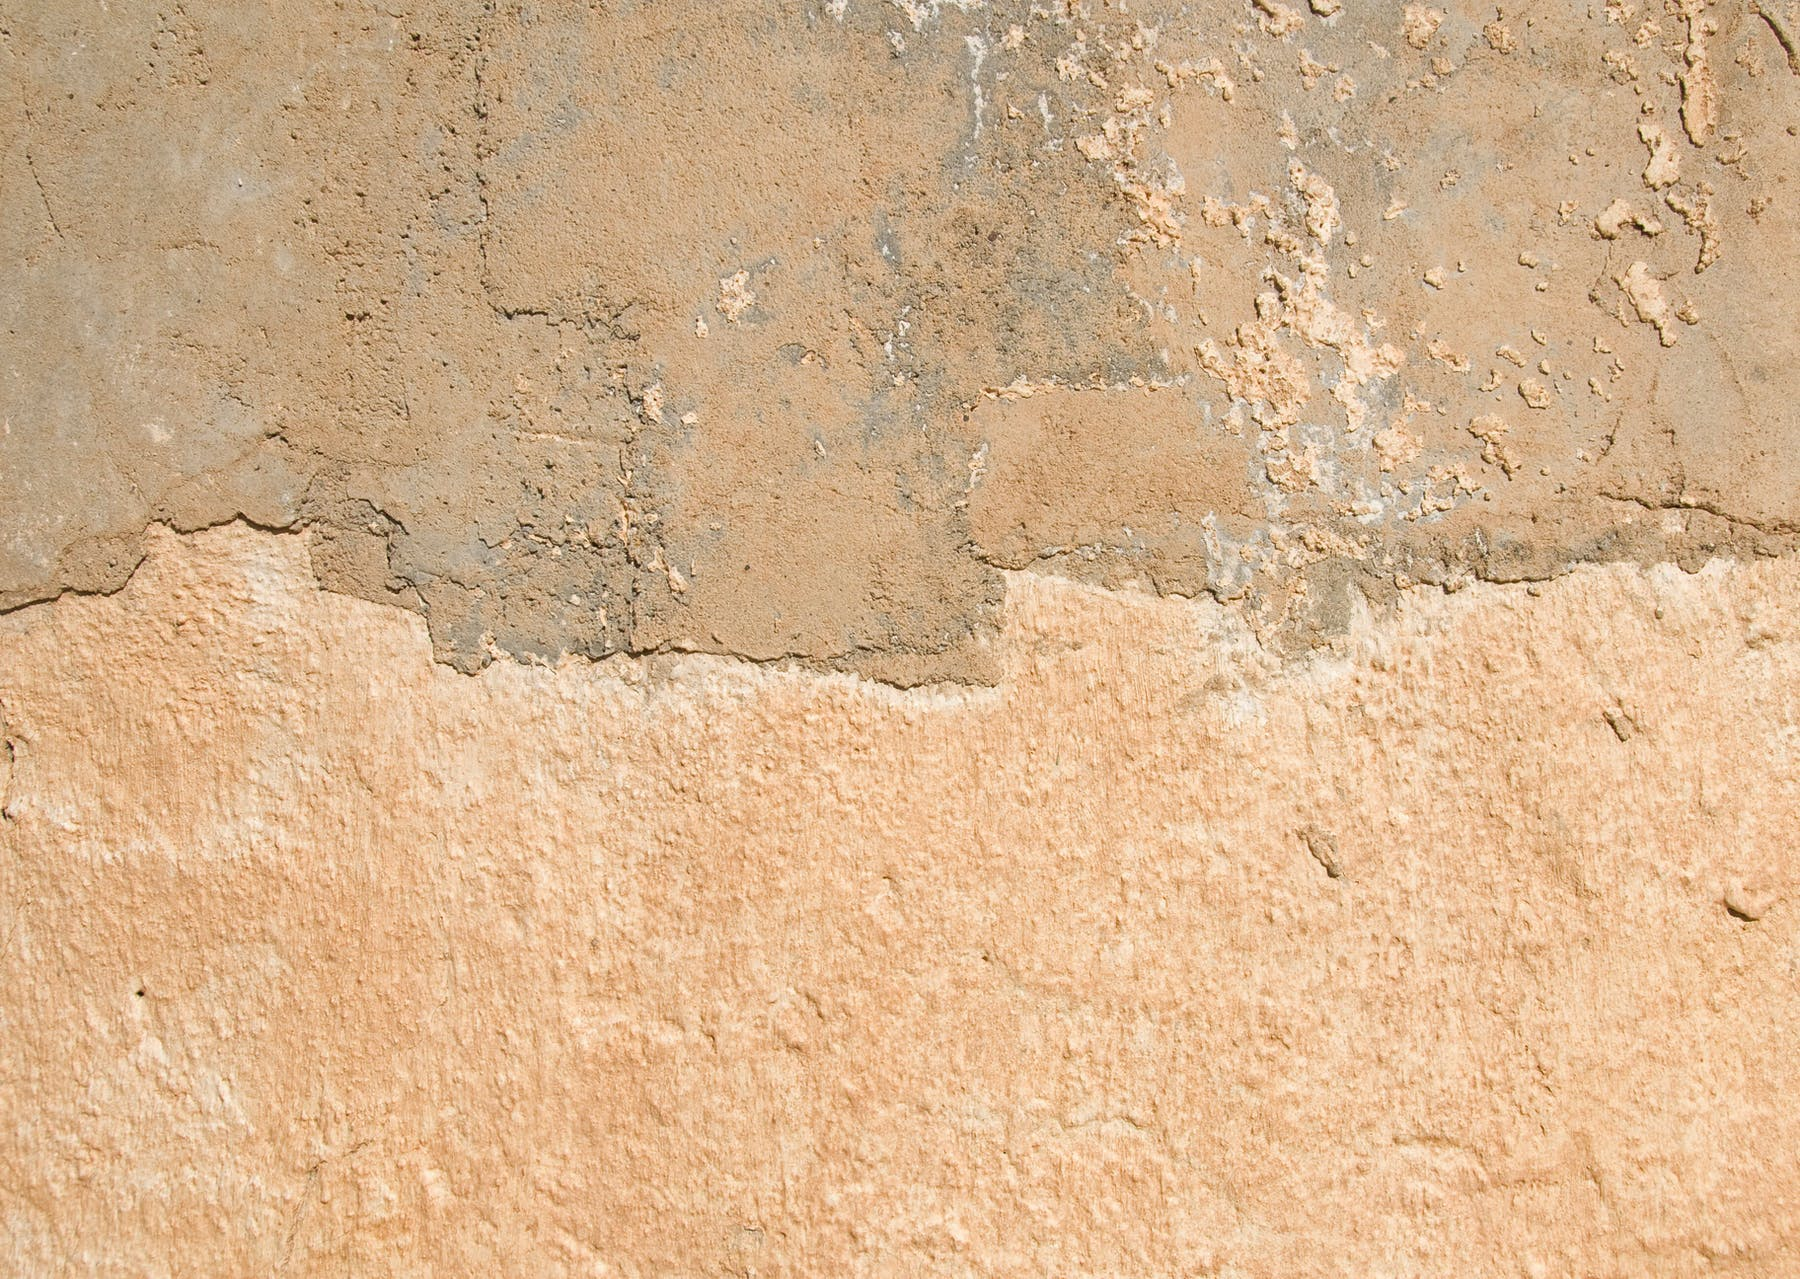 a close up of a brick wall